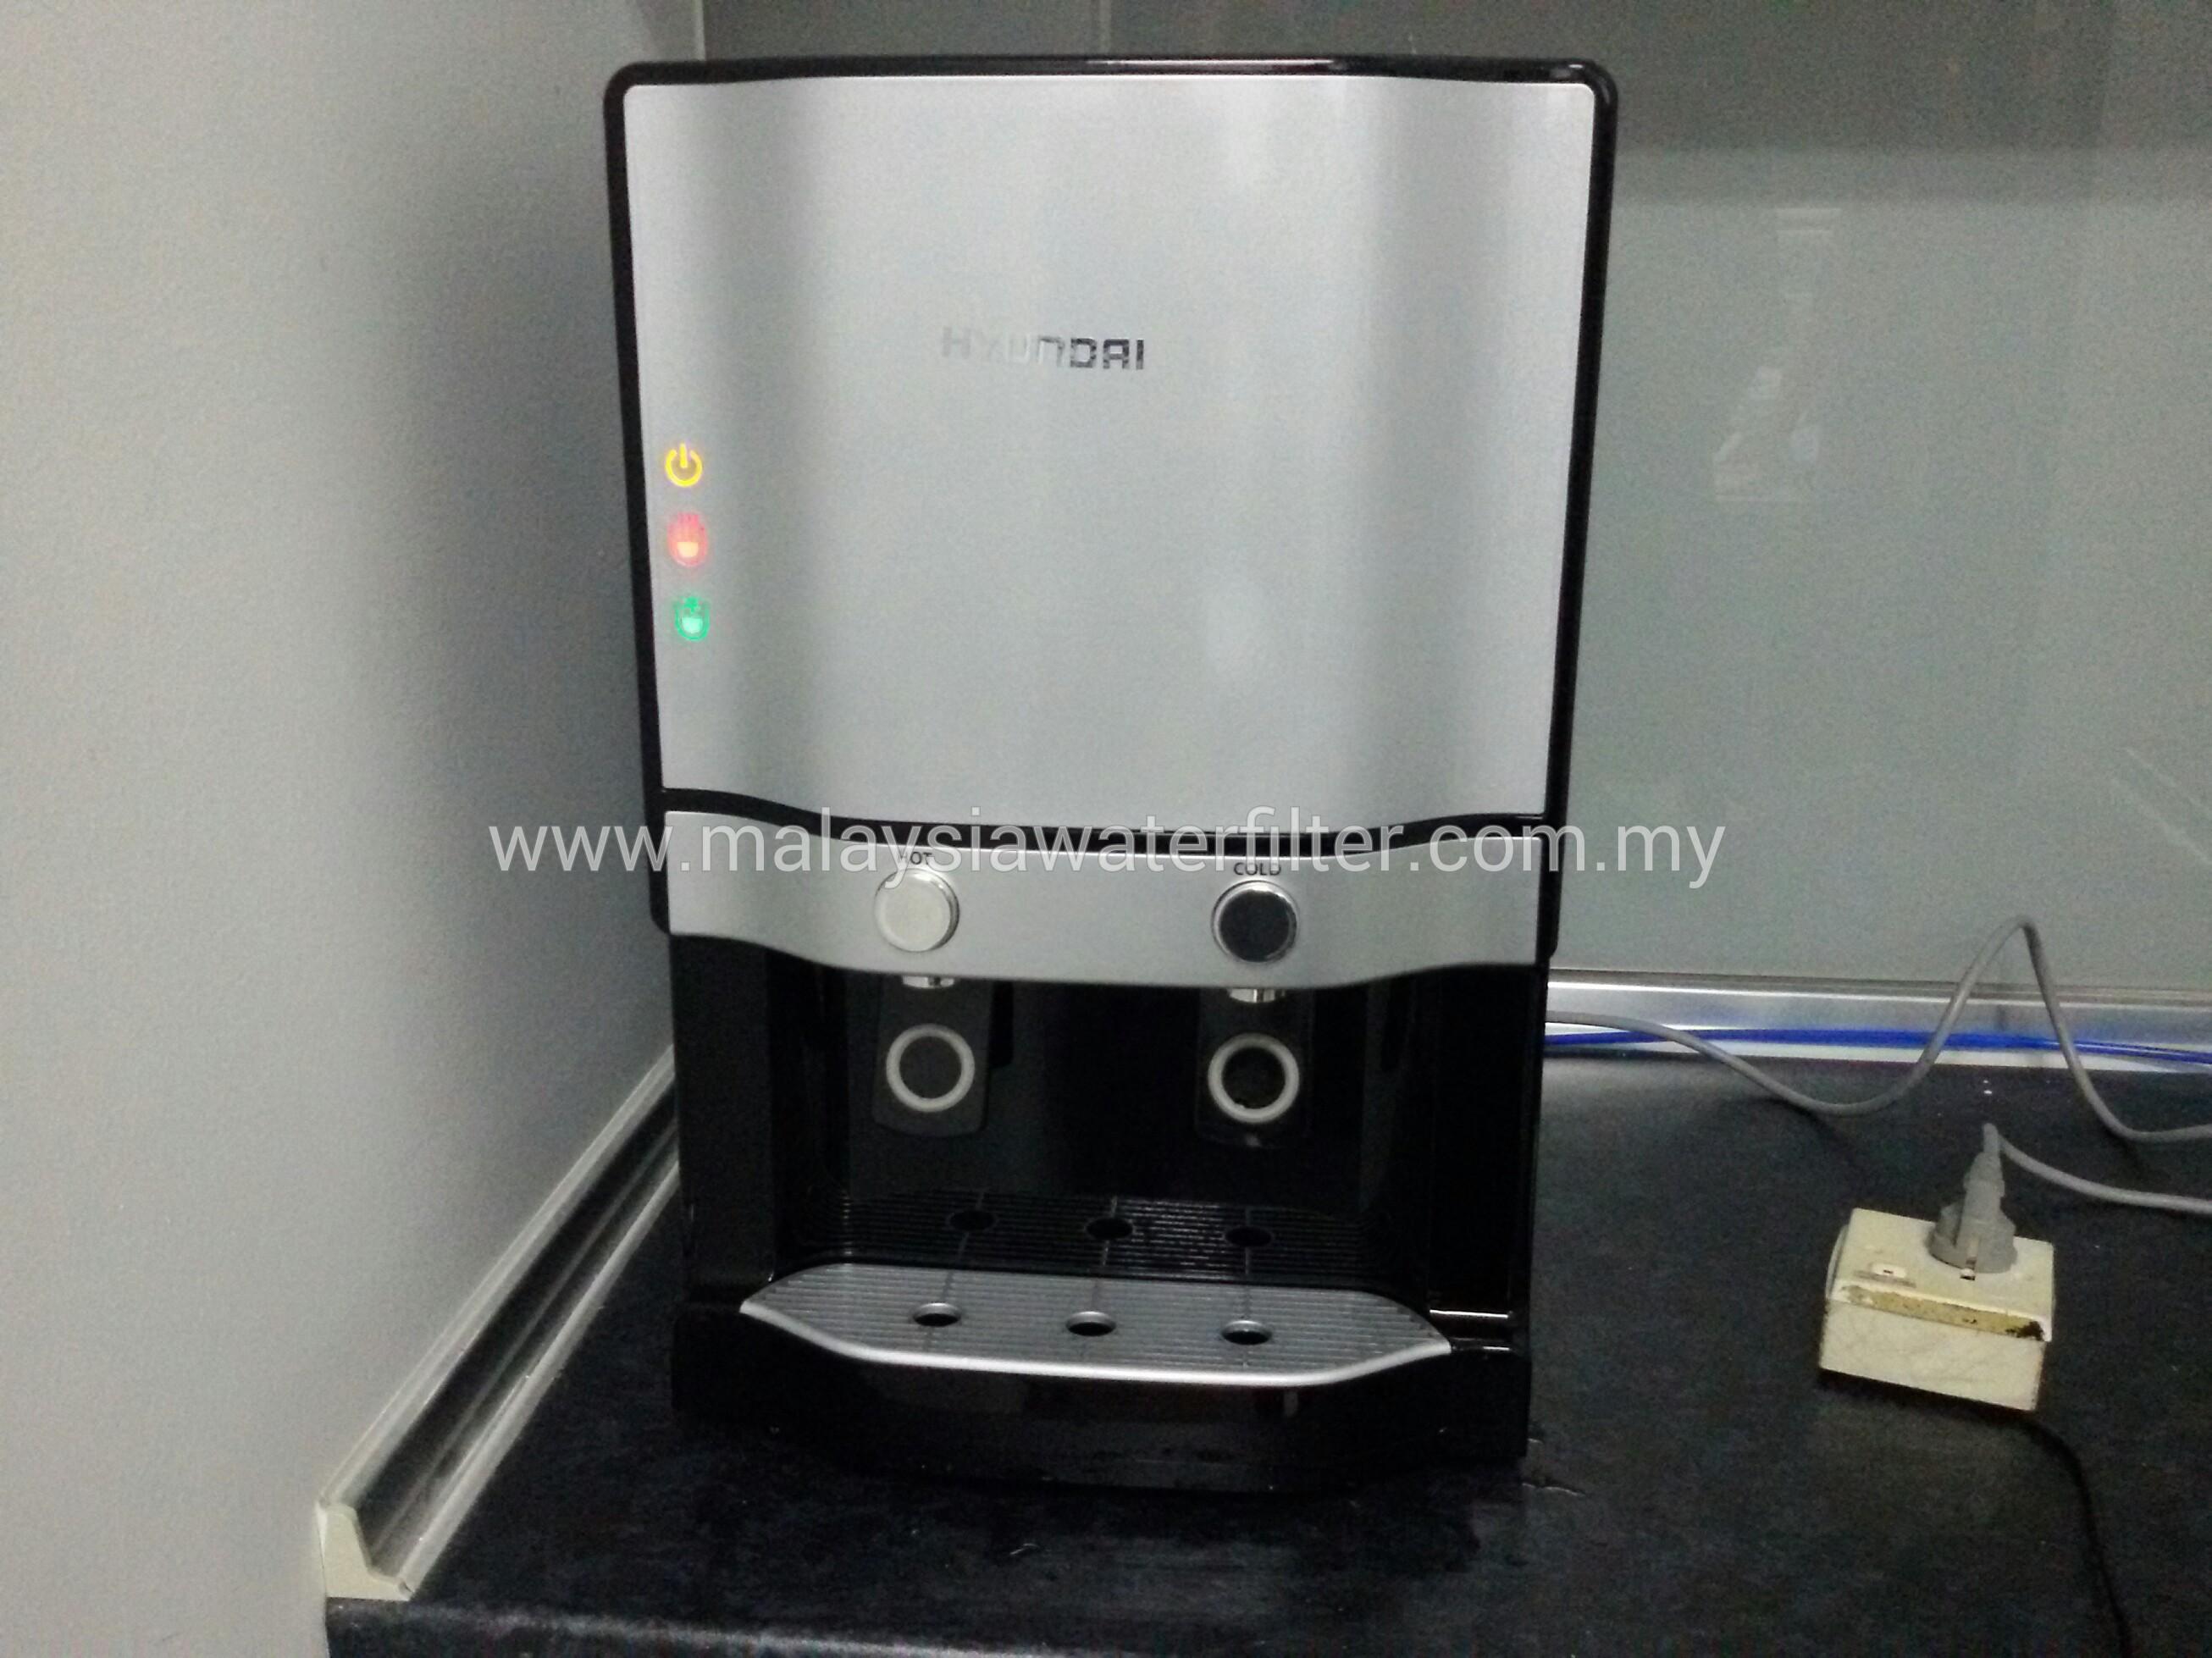 Water Filtration Dispenser Installation Case 4 Weguard Hyundai Pts 2001 Hot Cold Water